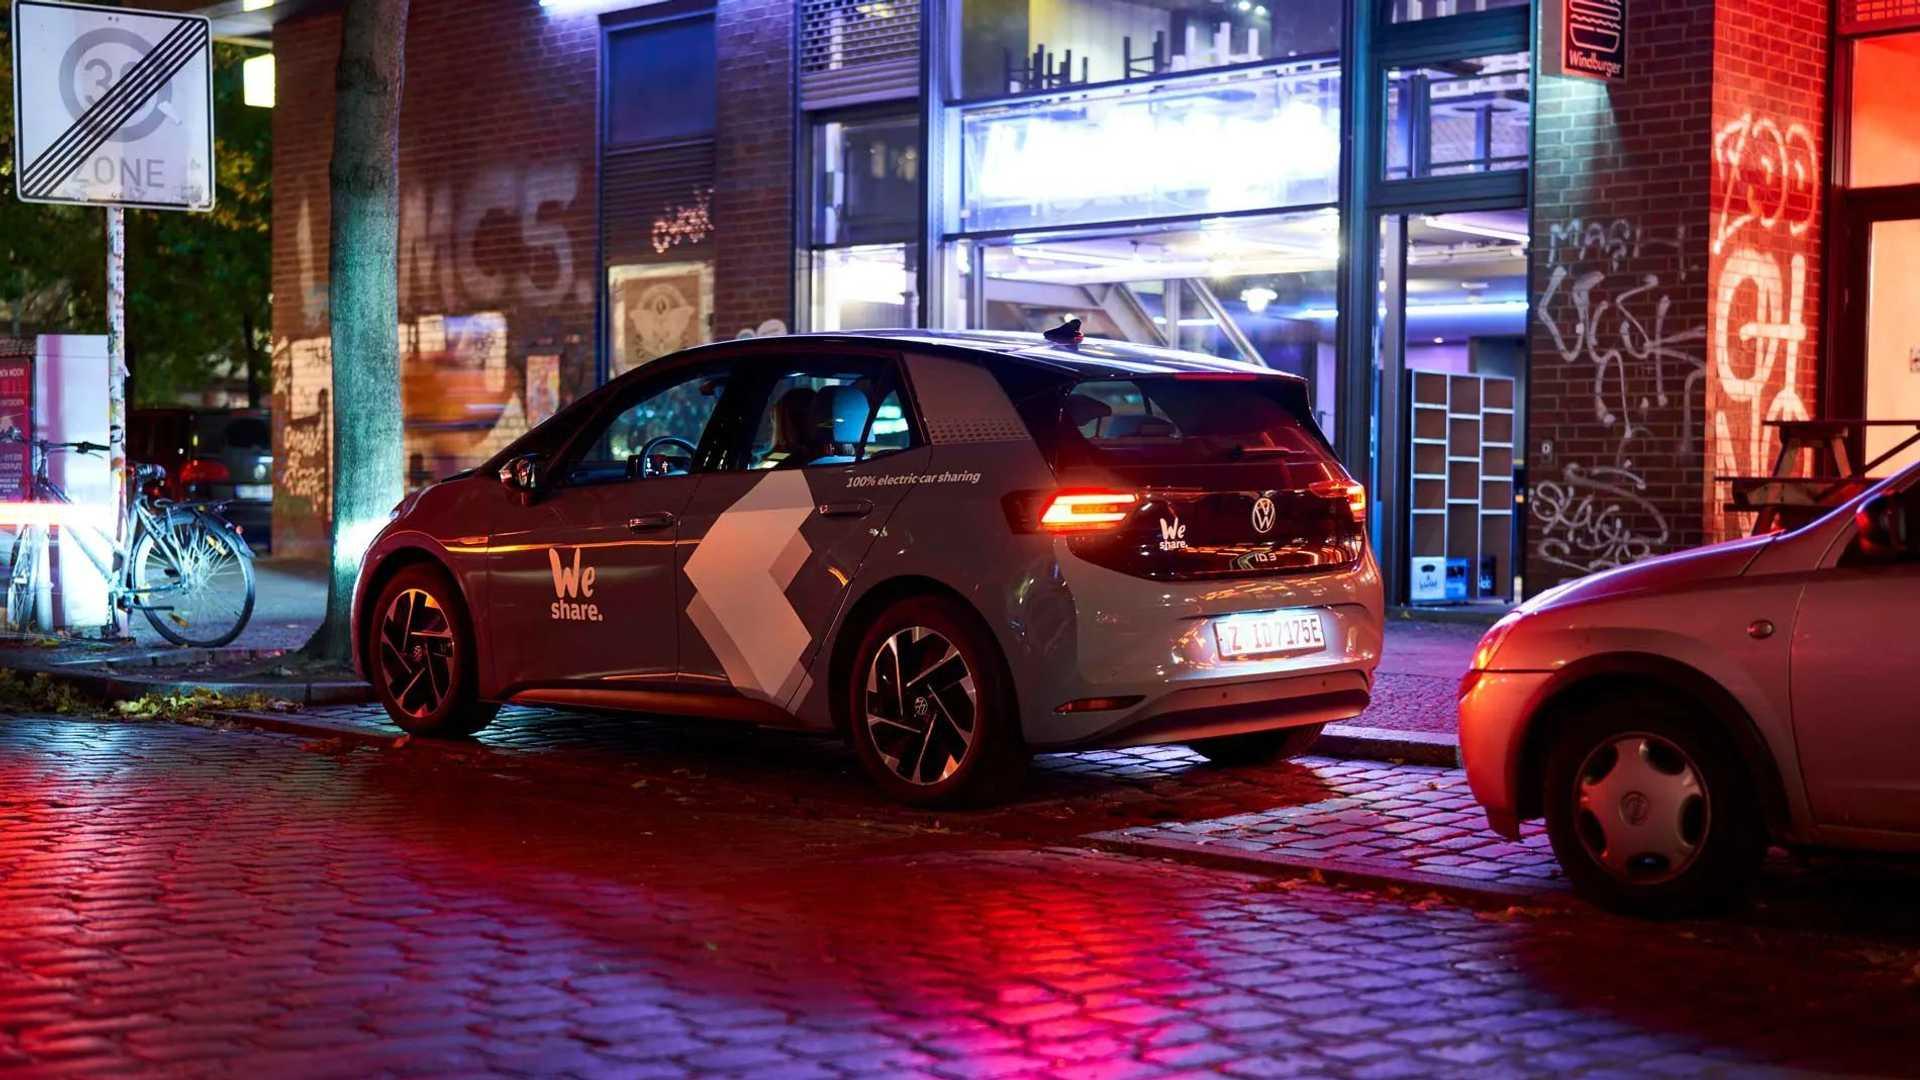 Volkswagen Weshare Berlin Id3 Parked